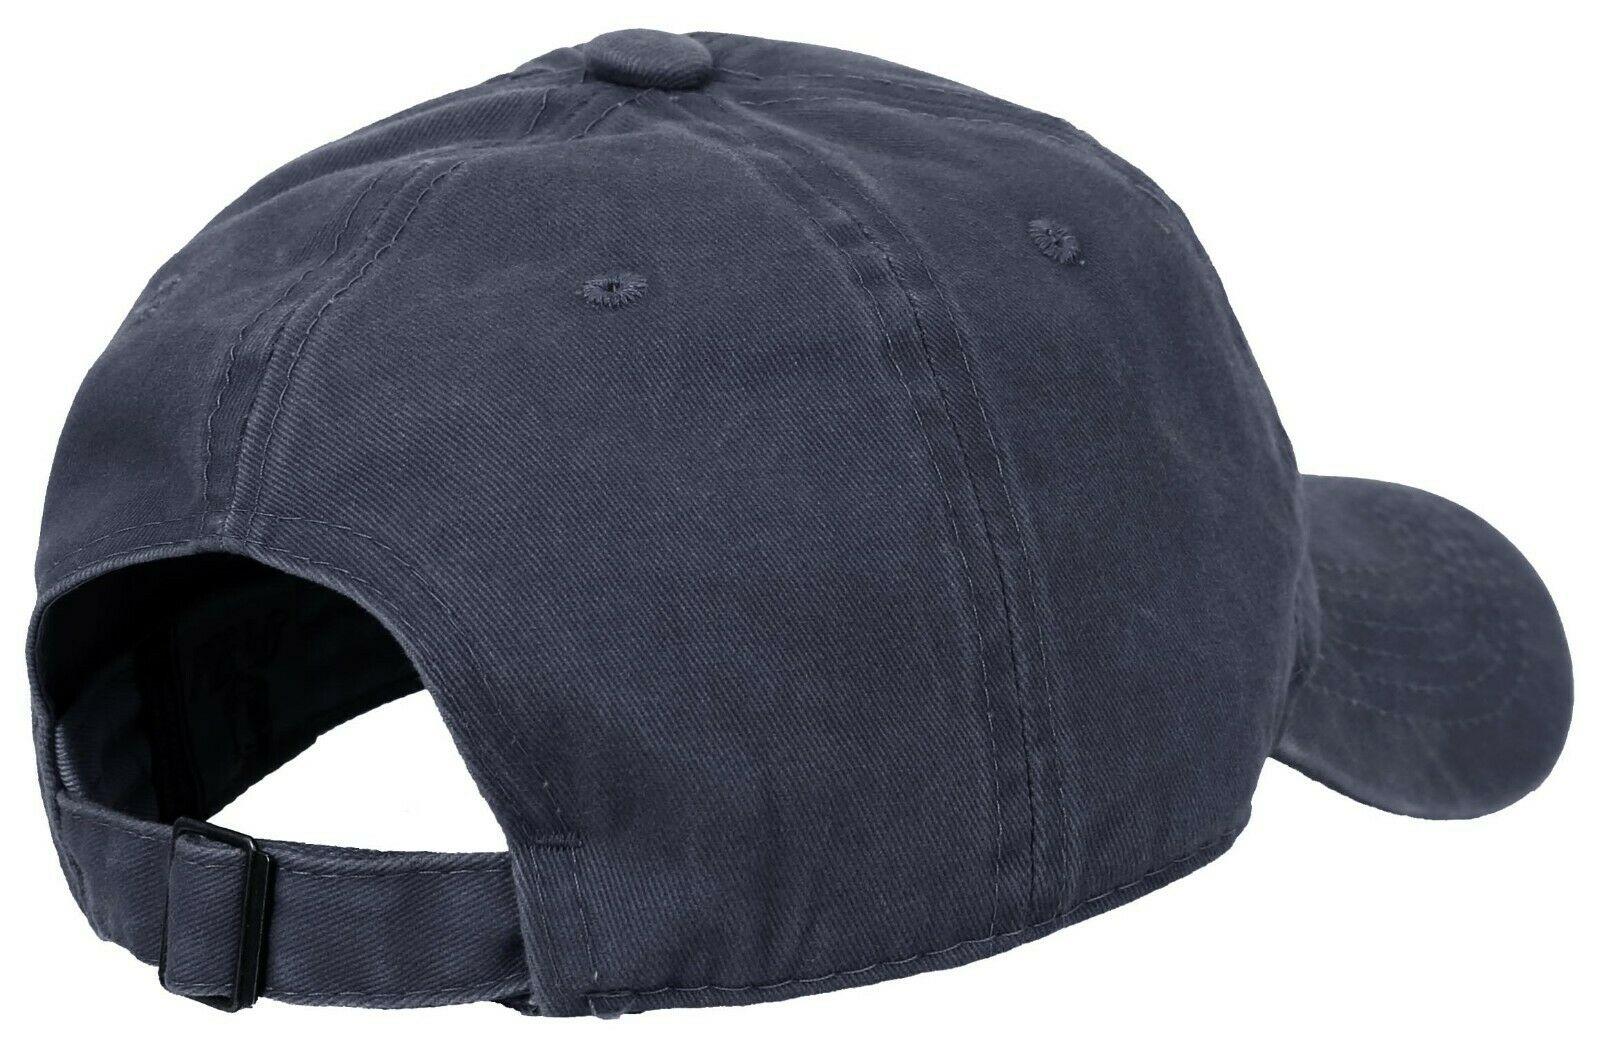 BASEBALL-CAP-Plain-Dad-Hat-Low-Profile-Vintage-Washed-Pigment-Adjustable thumbnail 5